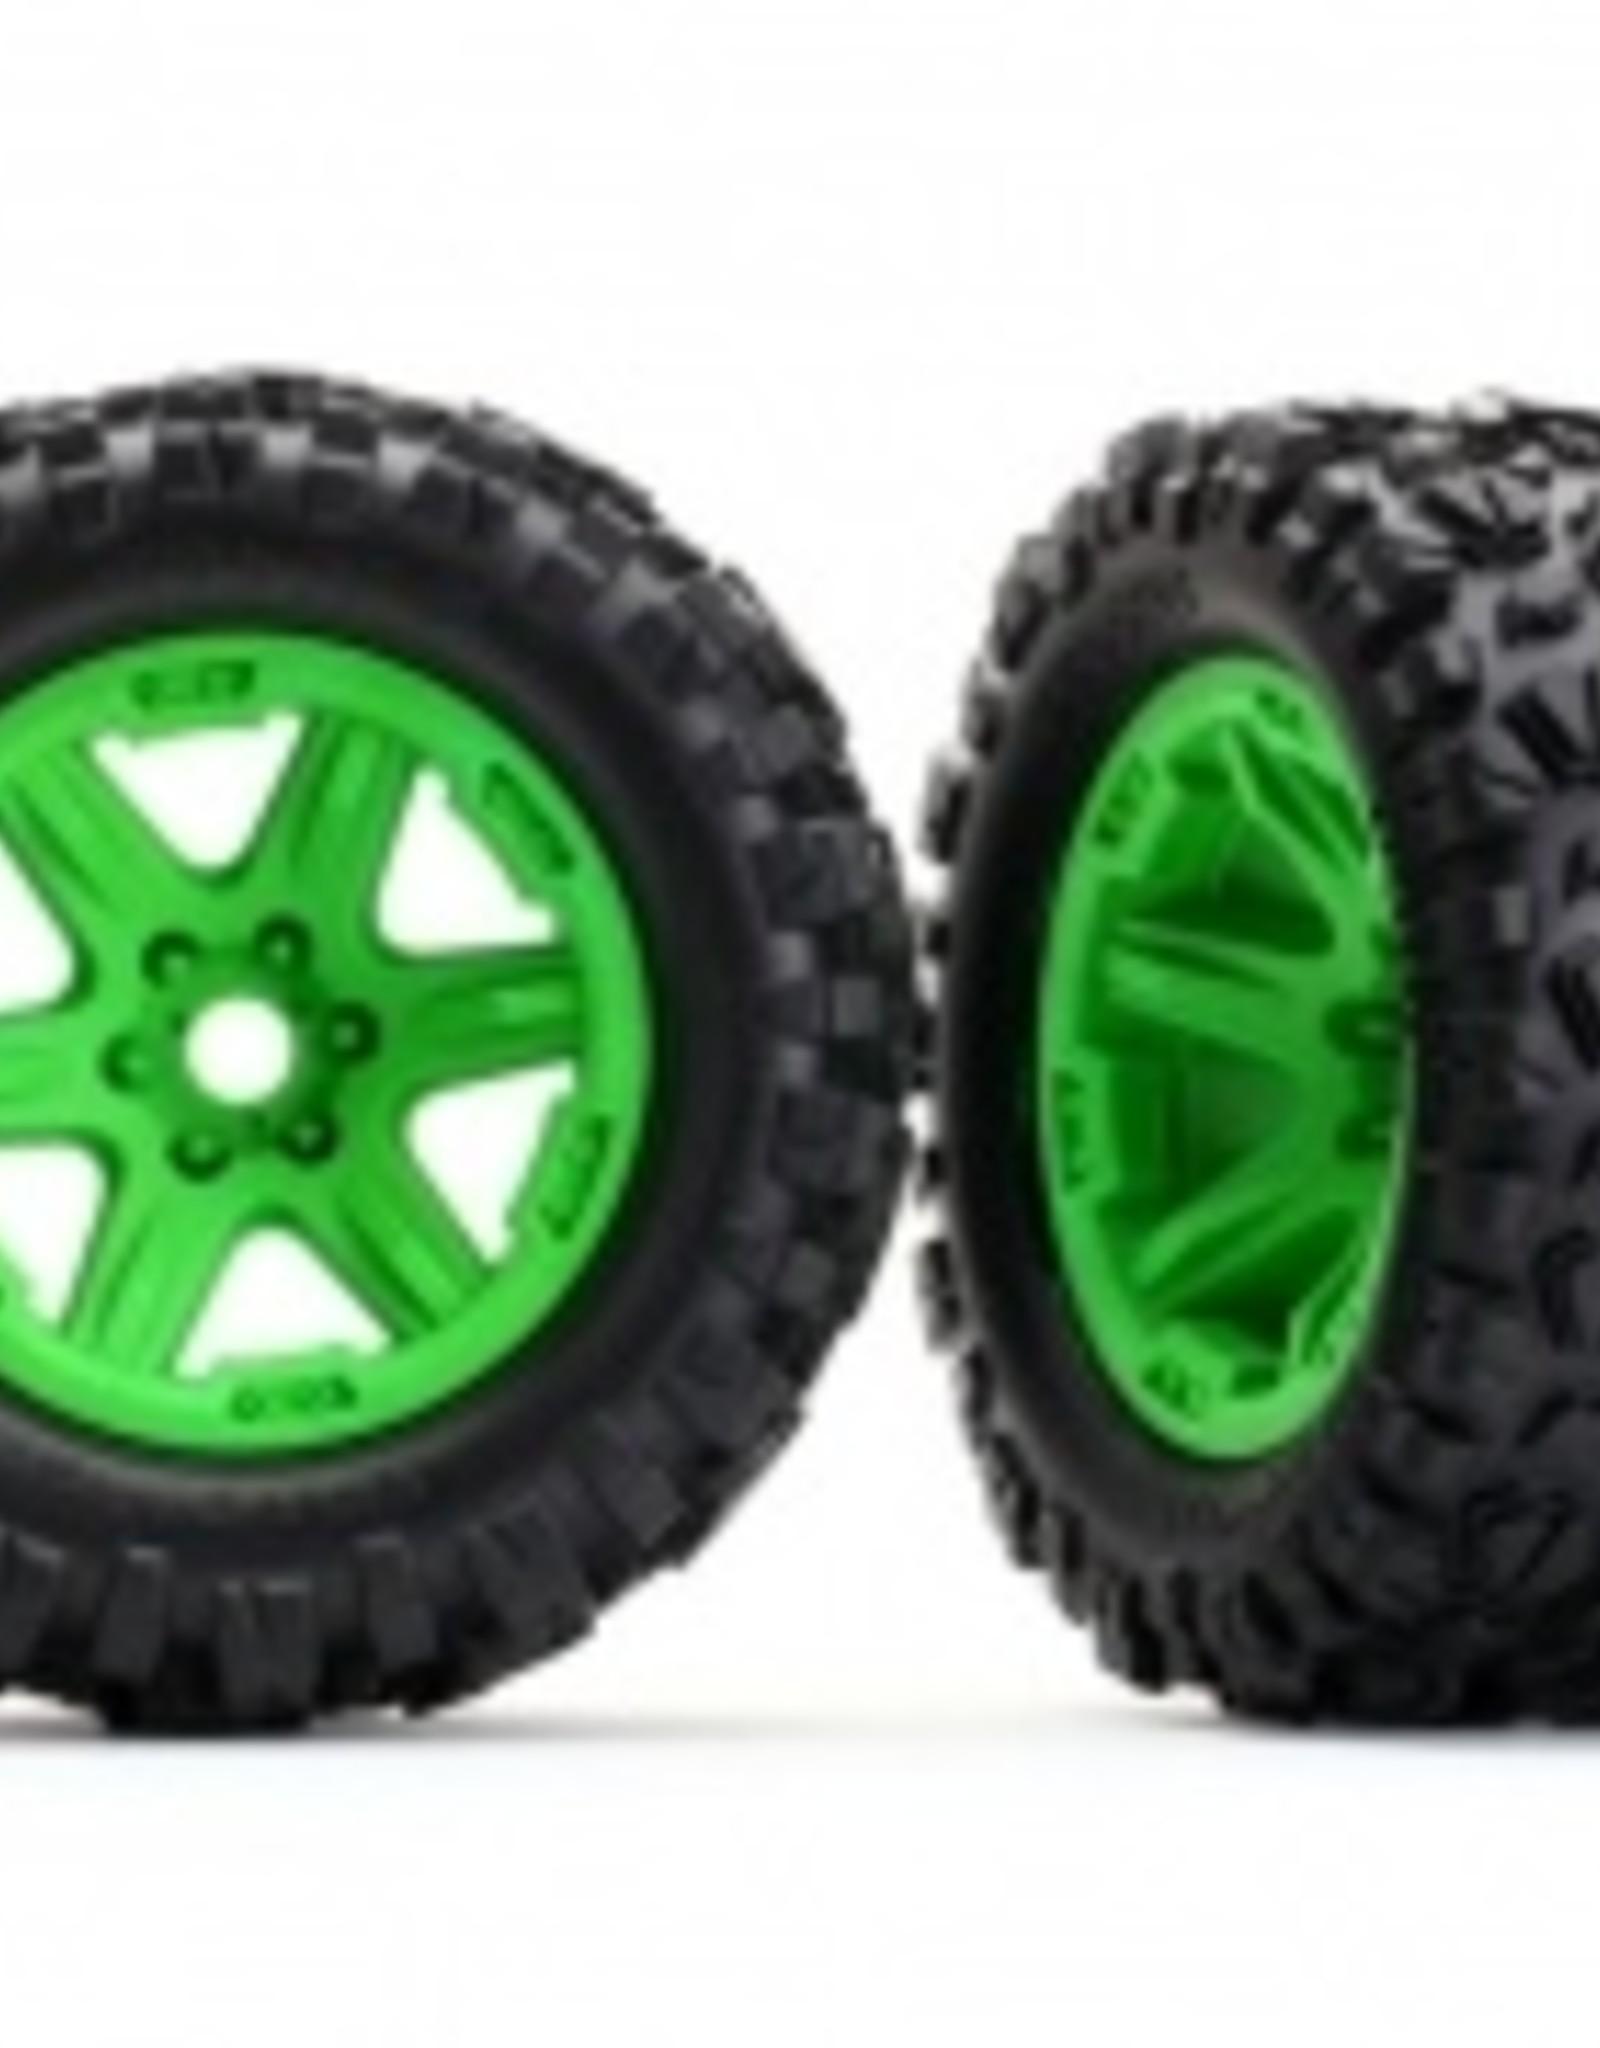 Traxxas Traxxas E-Revo Tires & wheels, assembled, glued (green wheels, Talon EXT tires, foam inserts) (2) (17mm splined) (TSM rated)